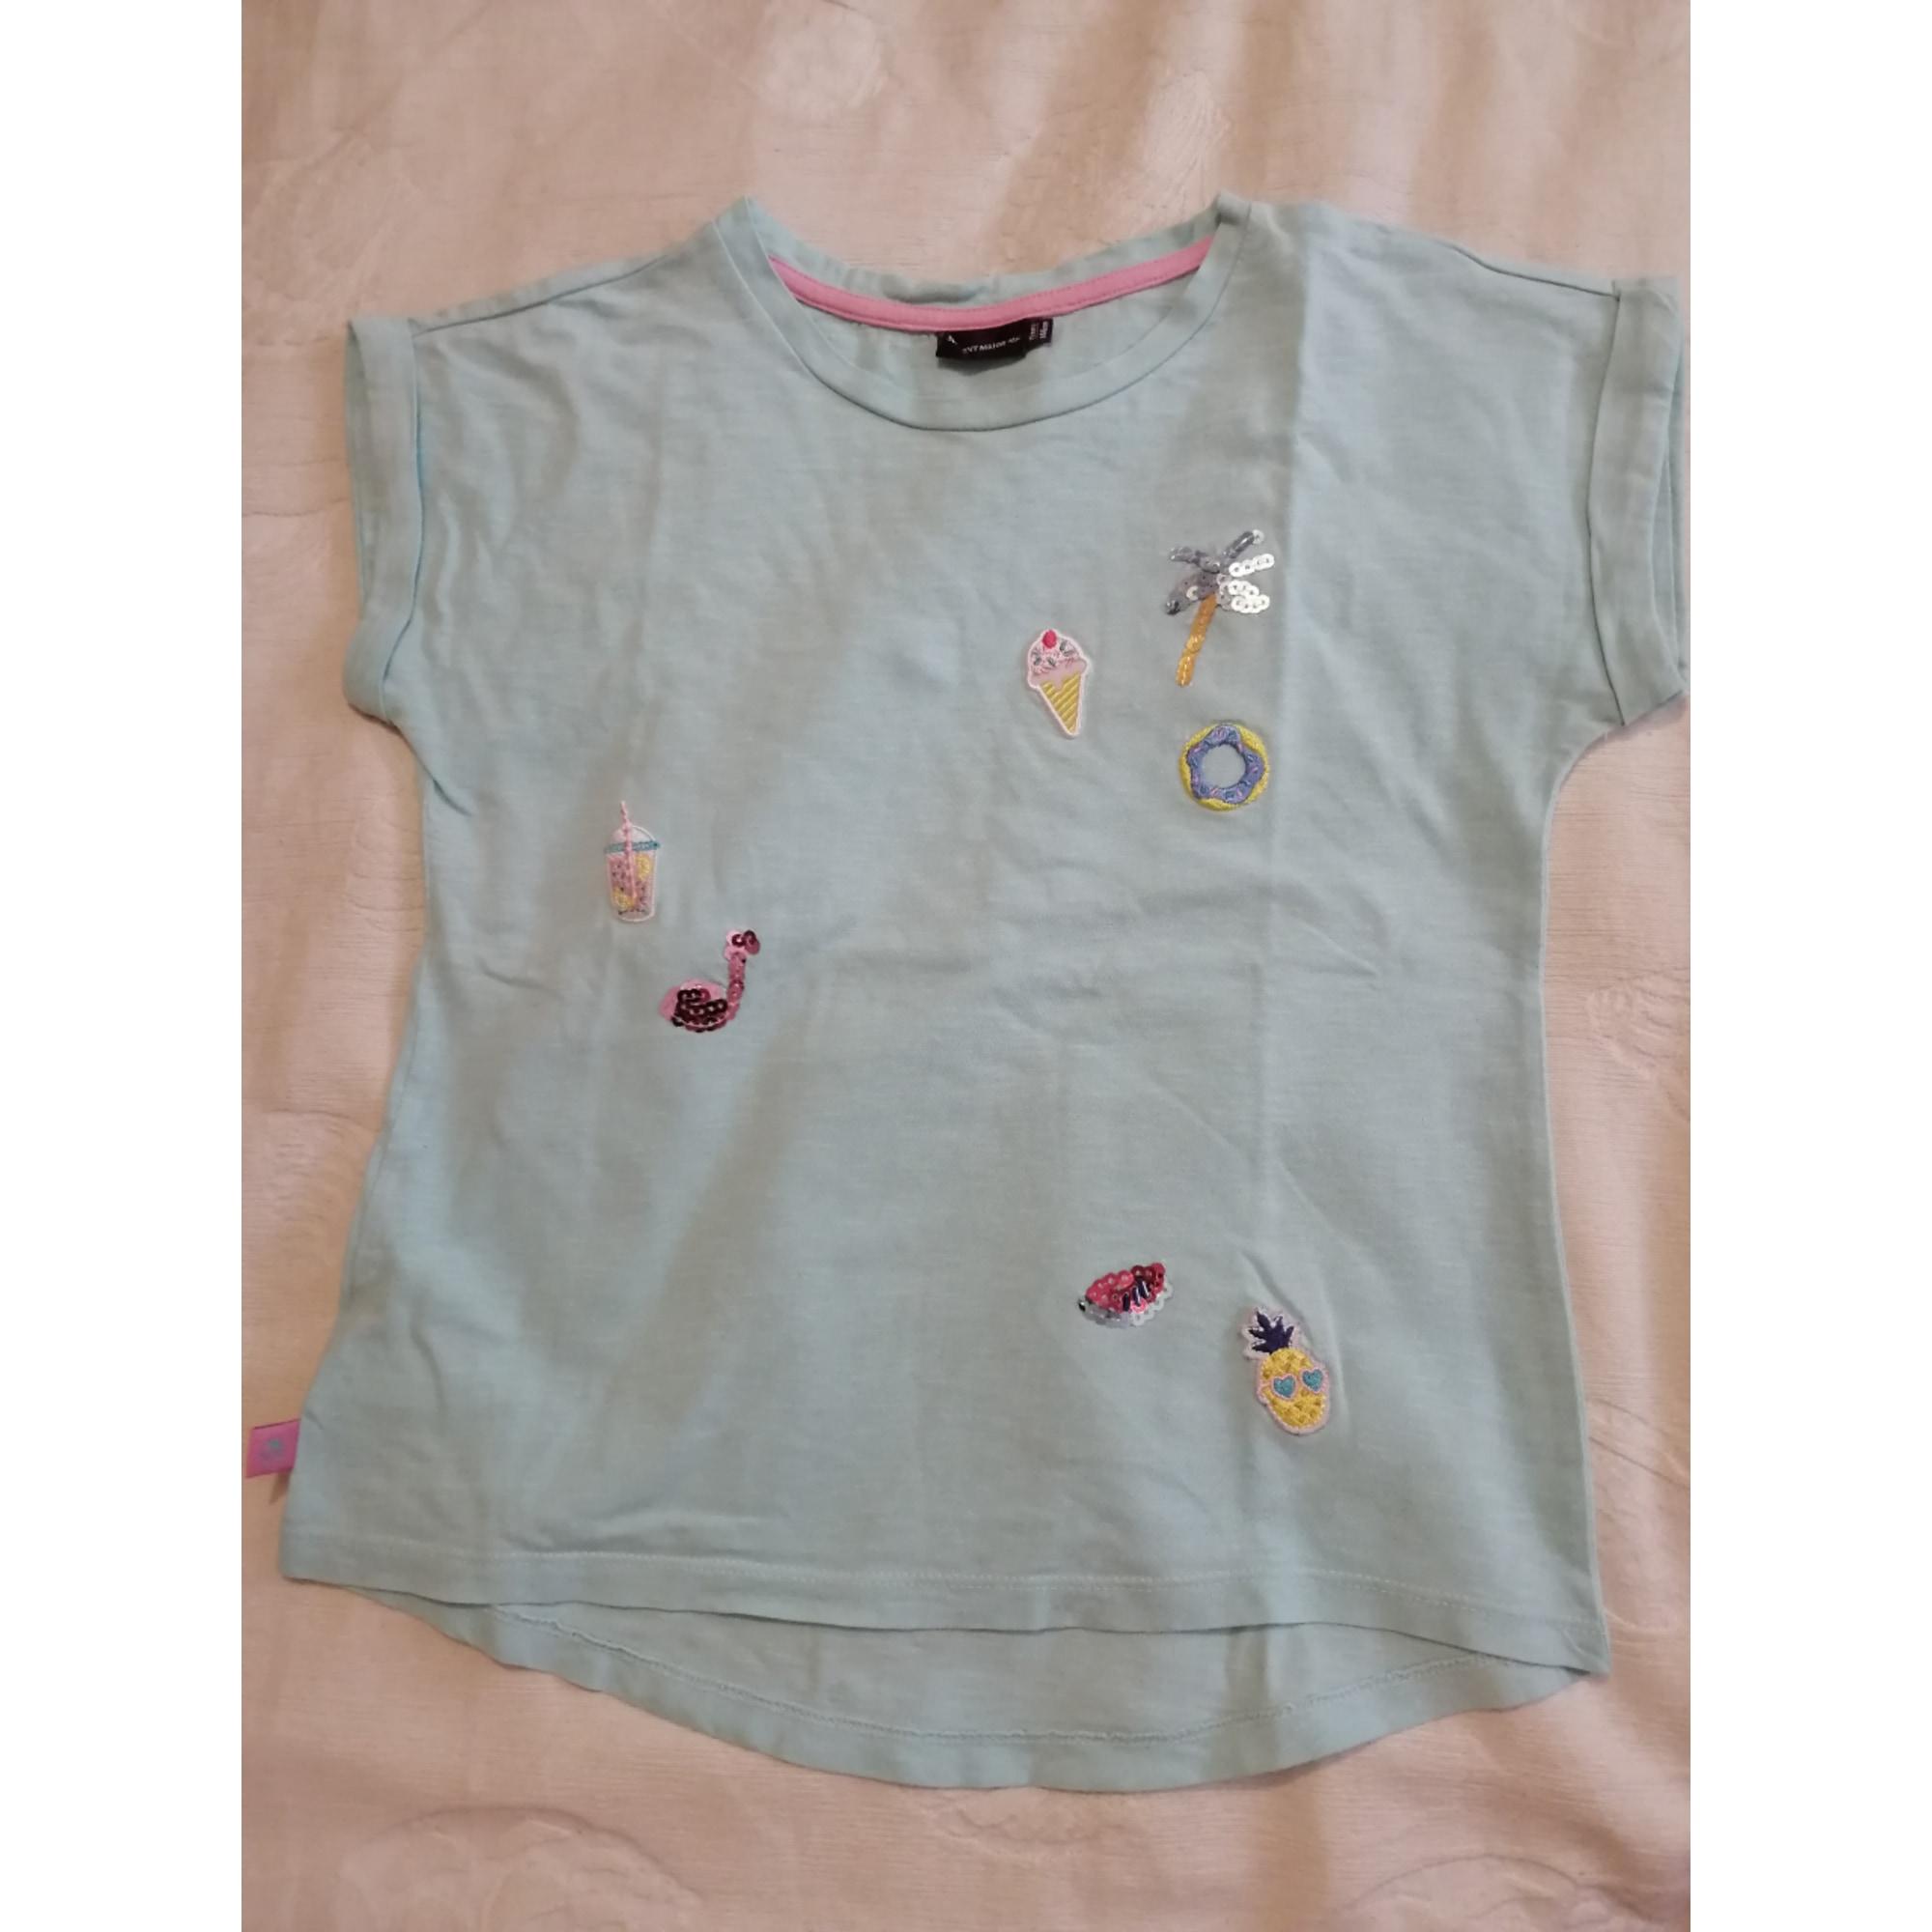 Top, Tee-shirt SERGENT MAJOR Vert